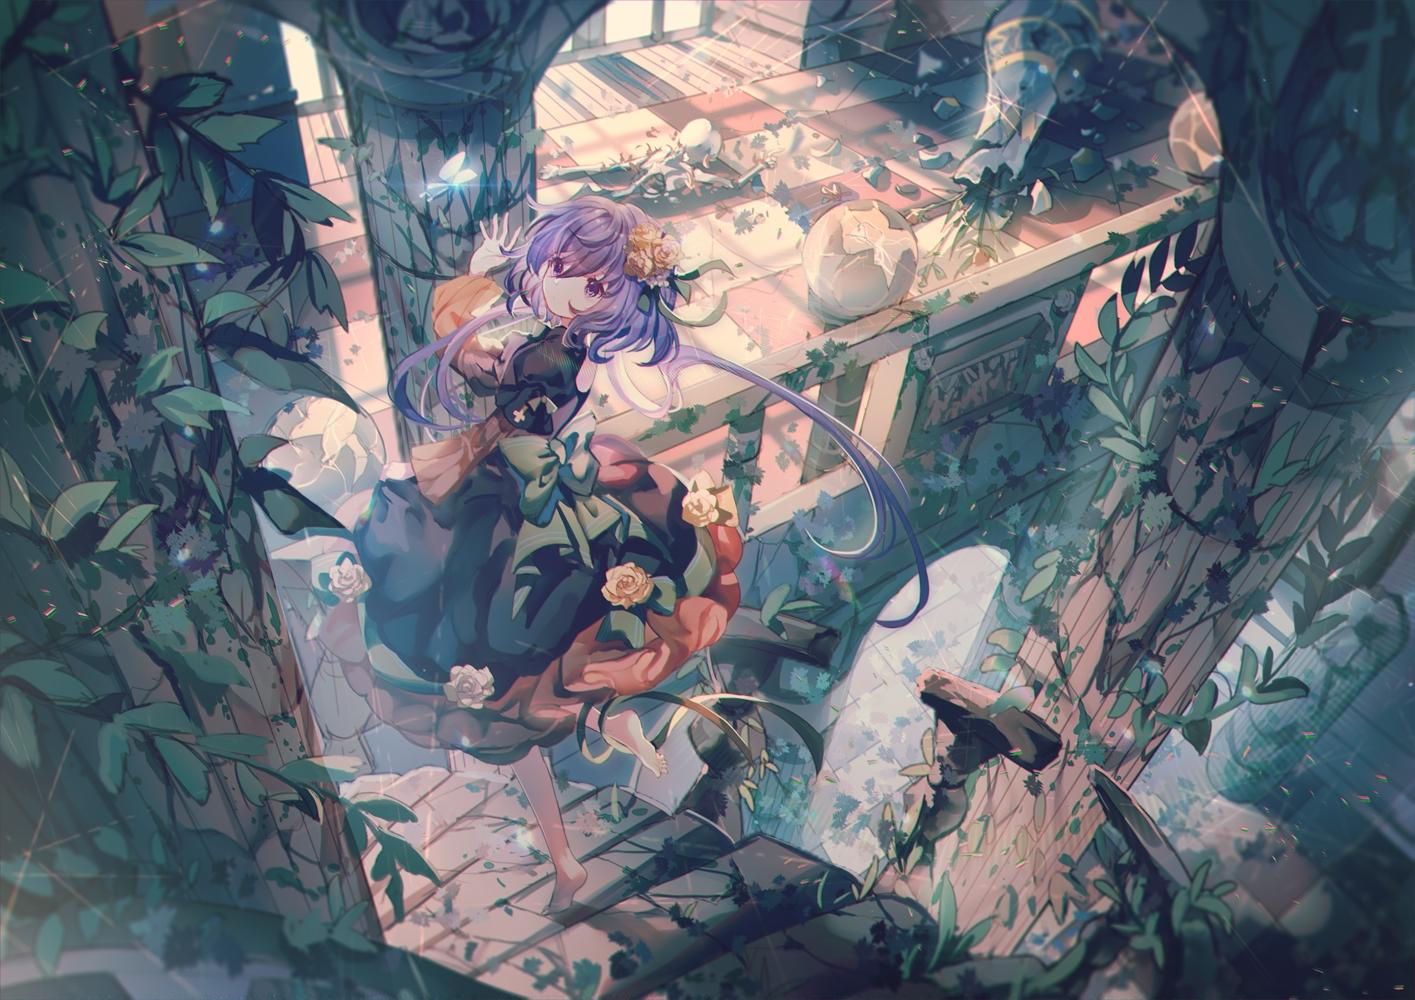 barefoot dress flowers purple_eyes purple_hair rose ruins scenic stairs touhou tsukumo_benben yasato